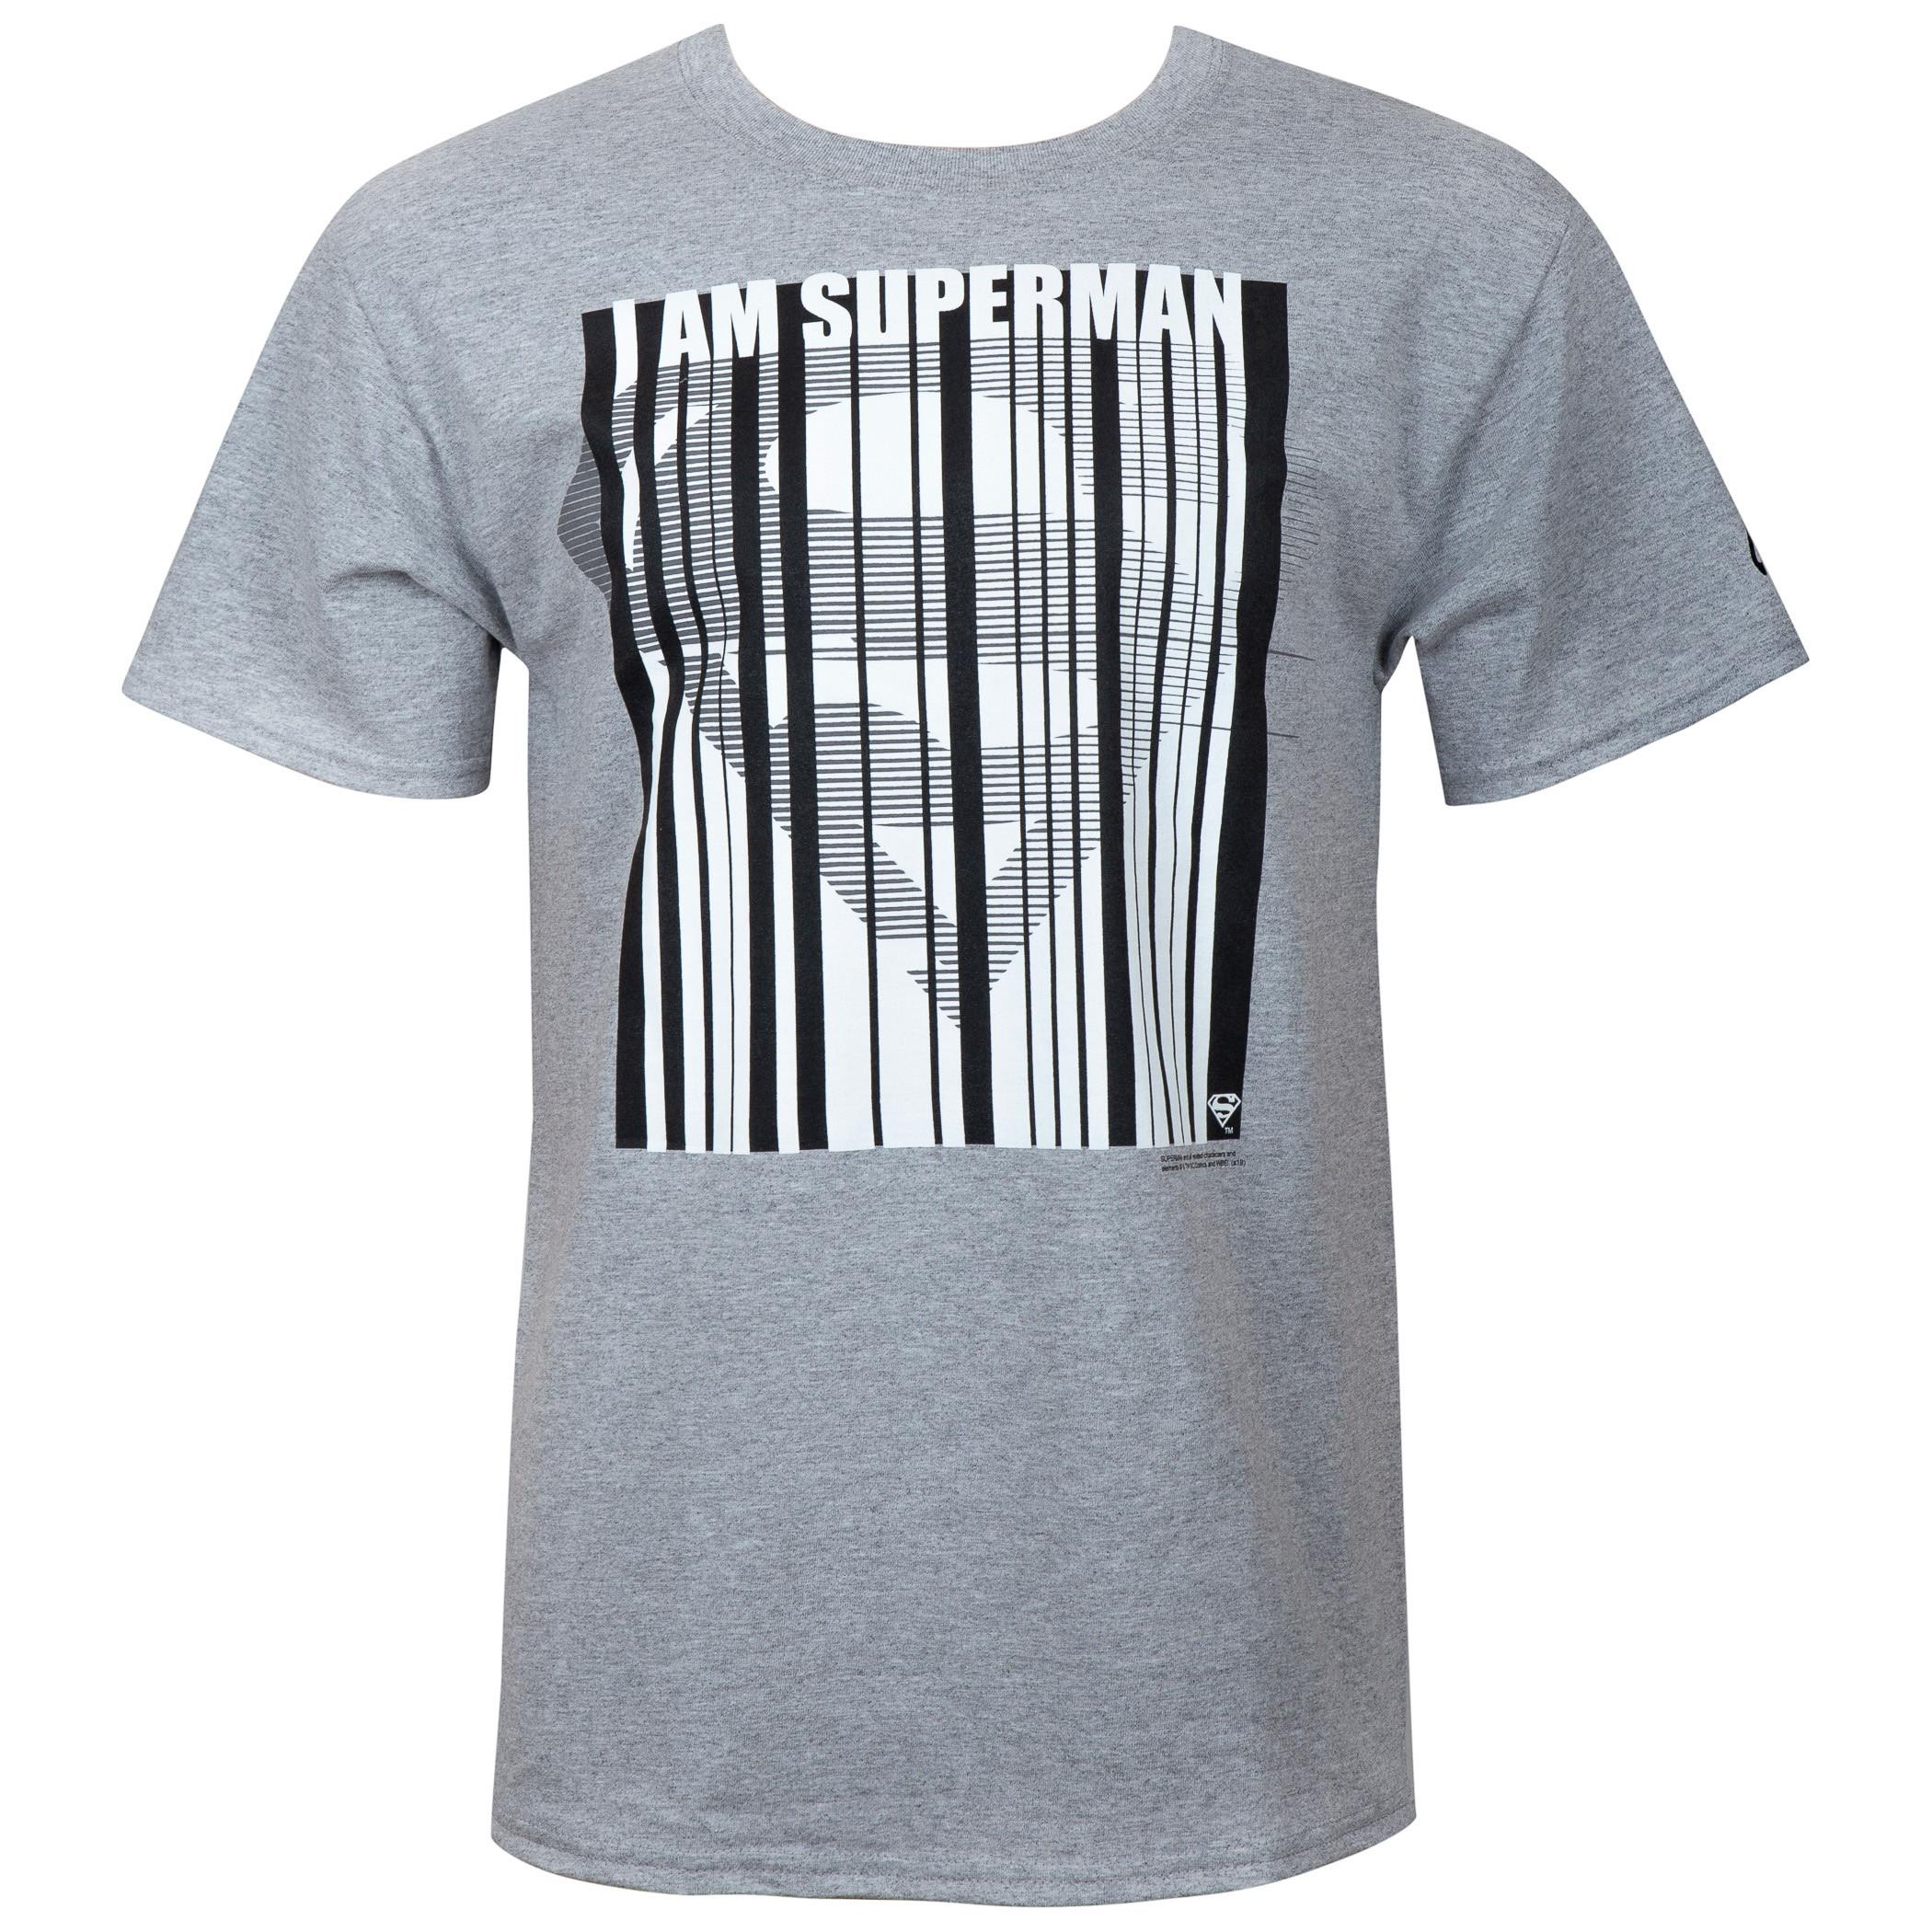 Superman Barcode Men's Grey T-Shirt